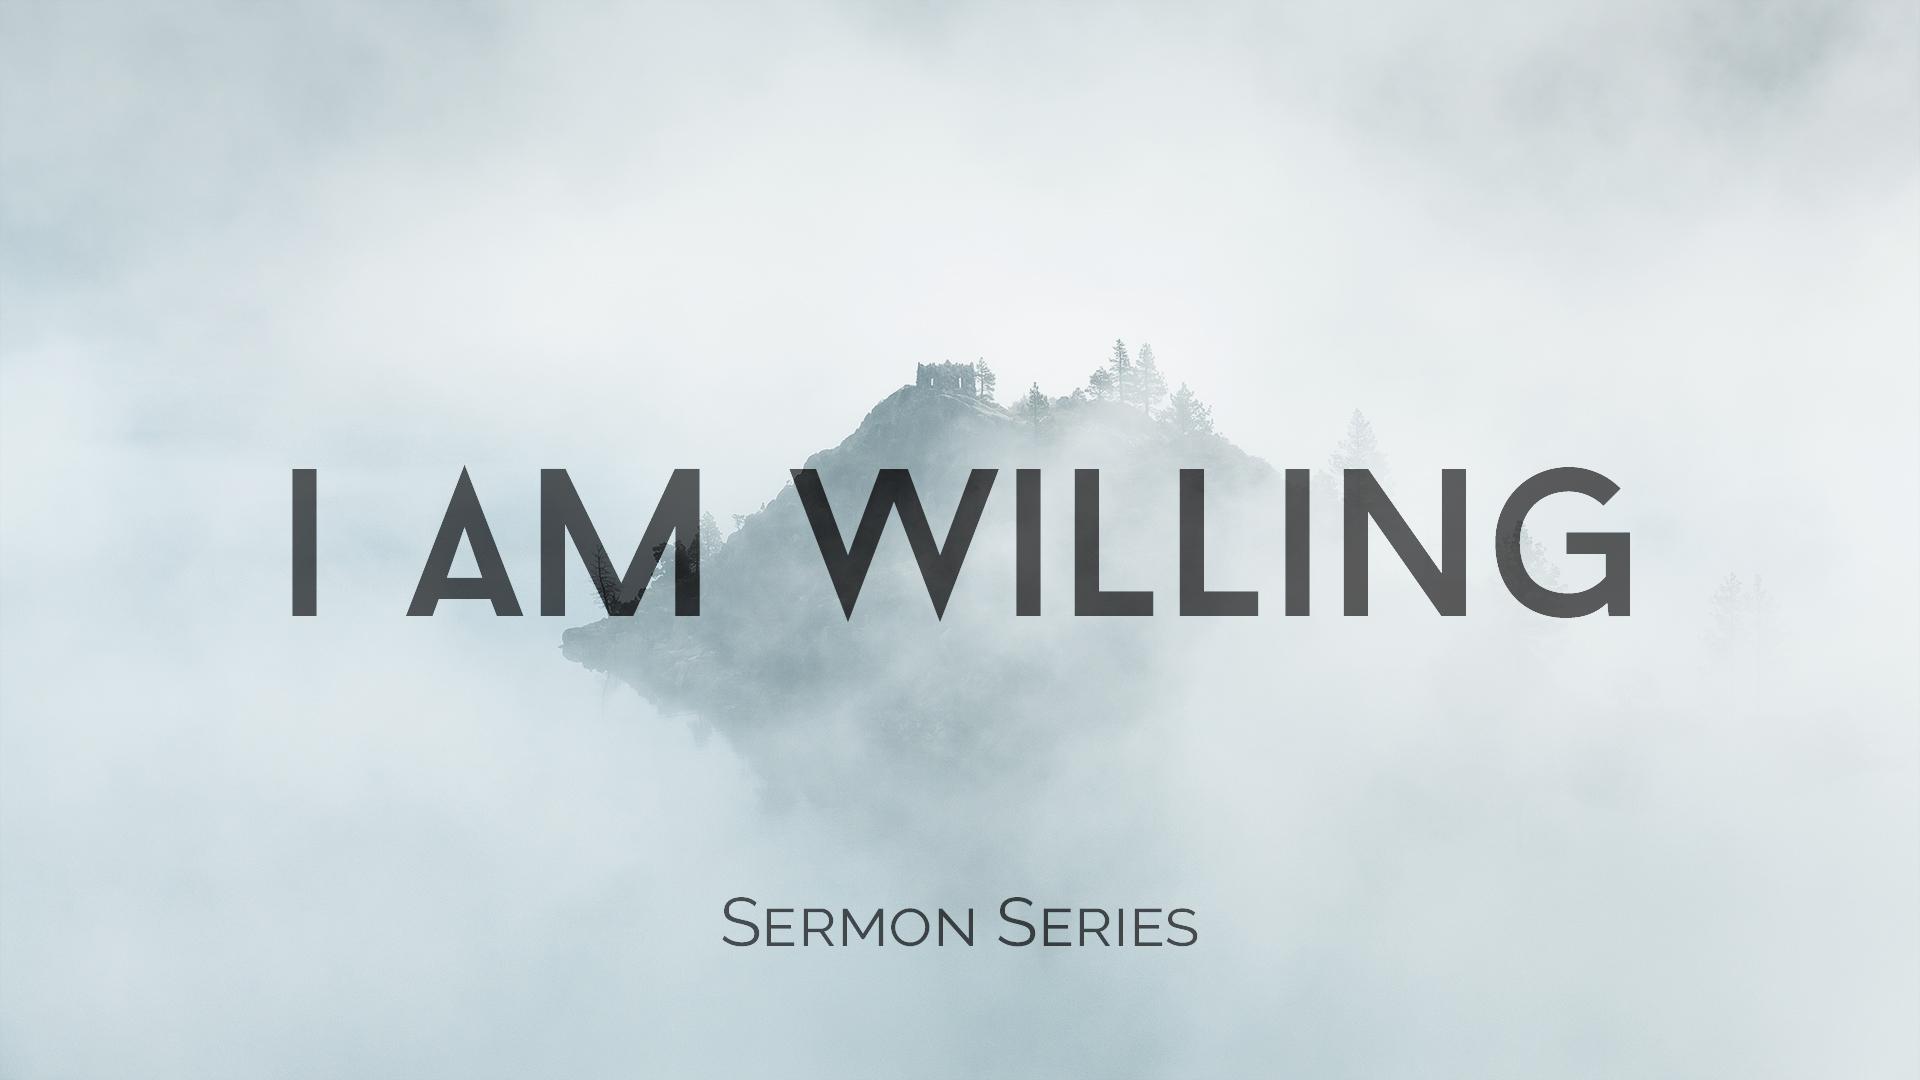 iamwilling-sermonseries.jpg